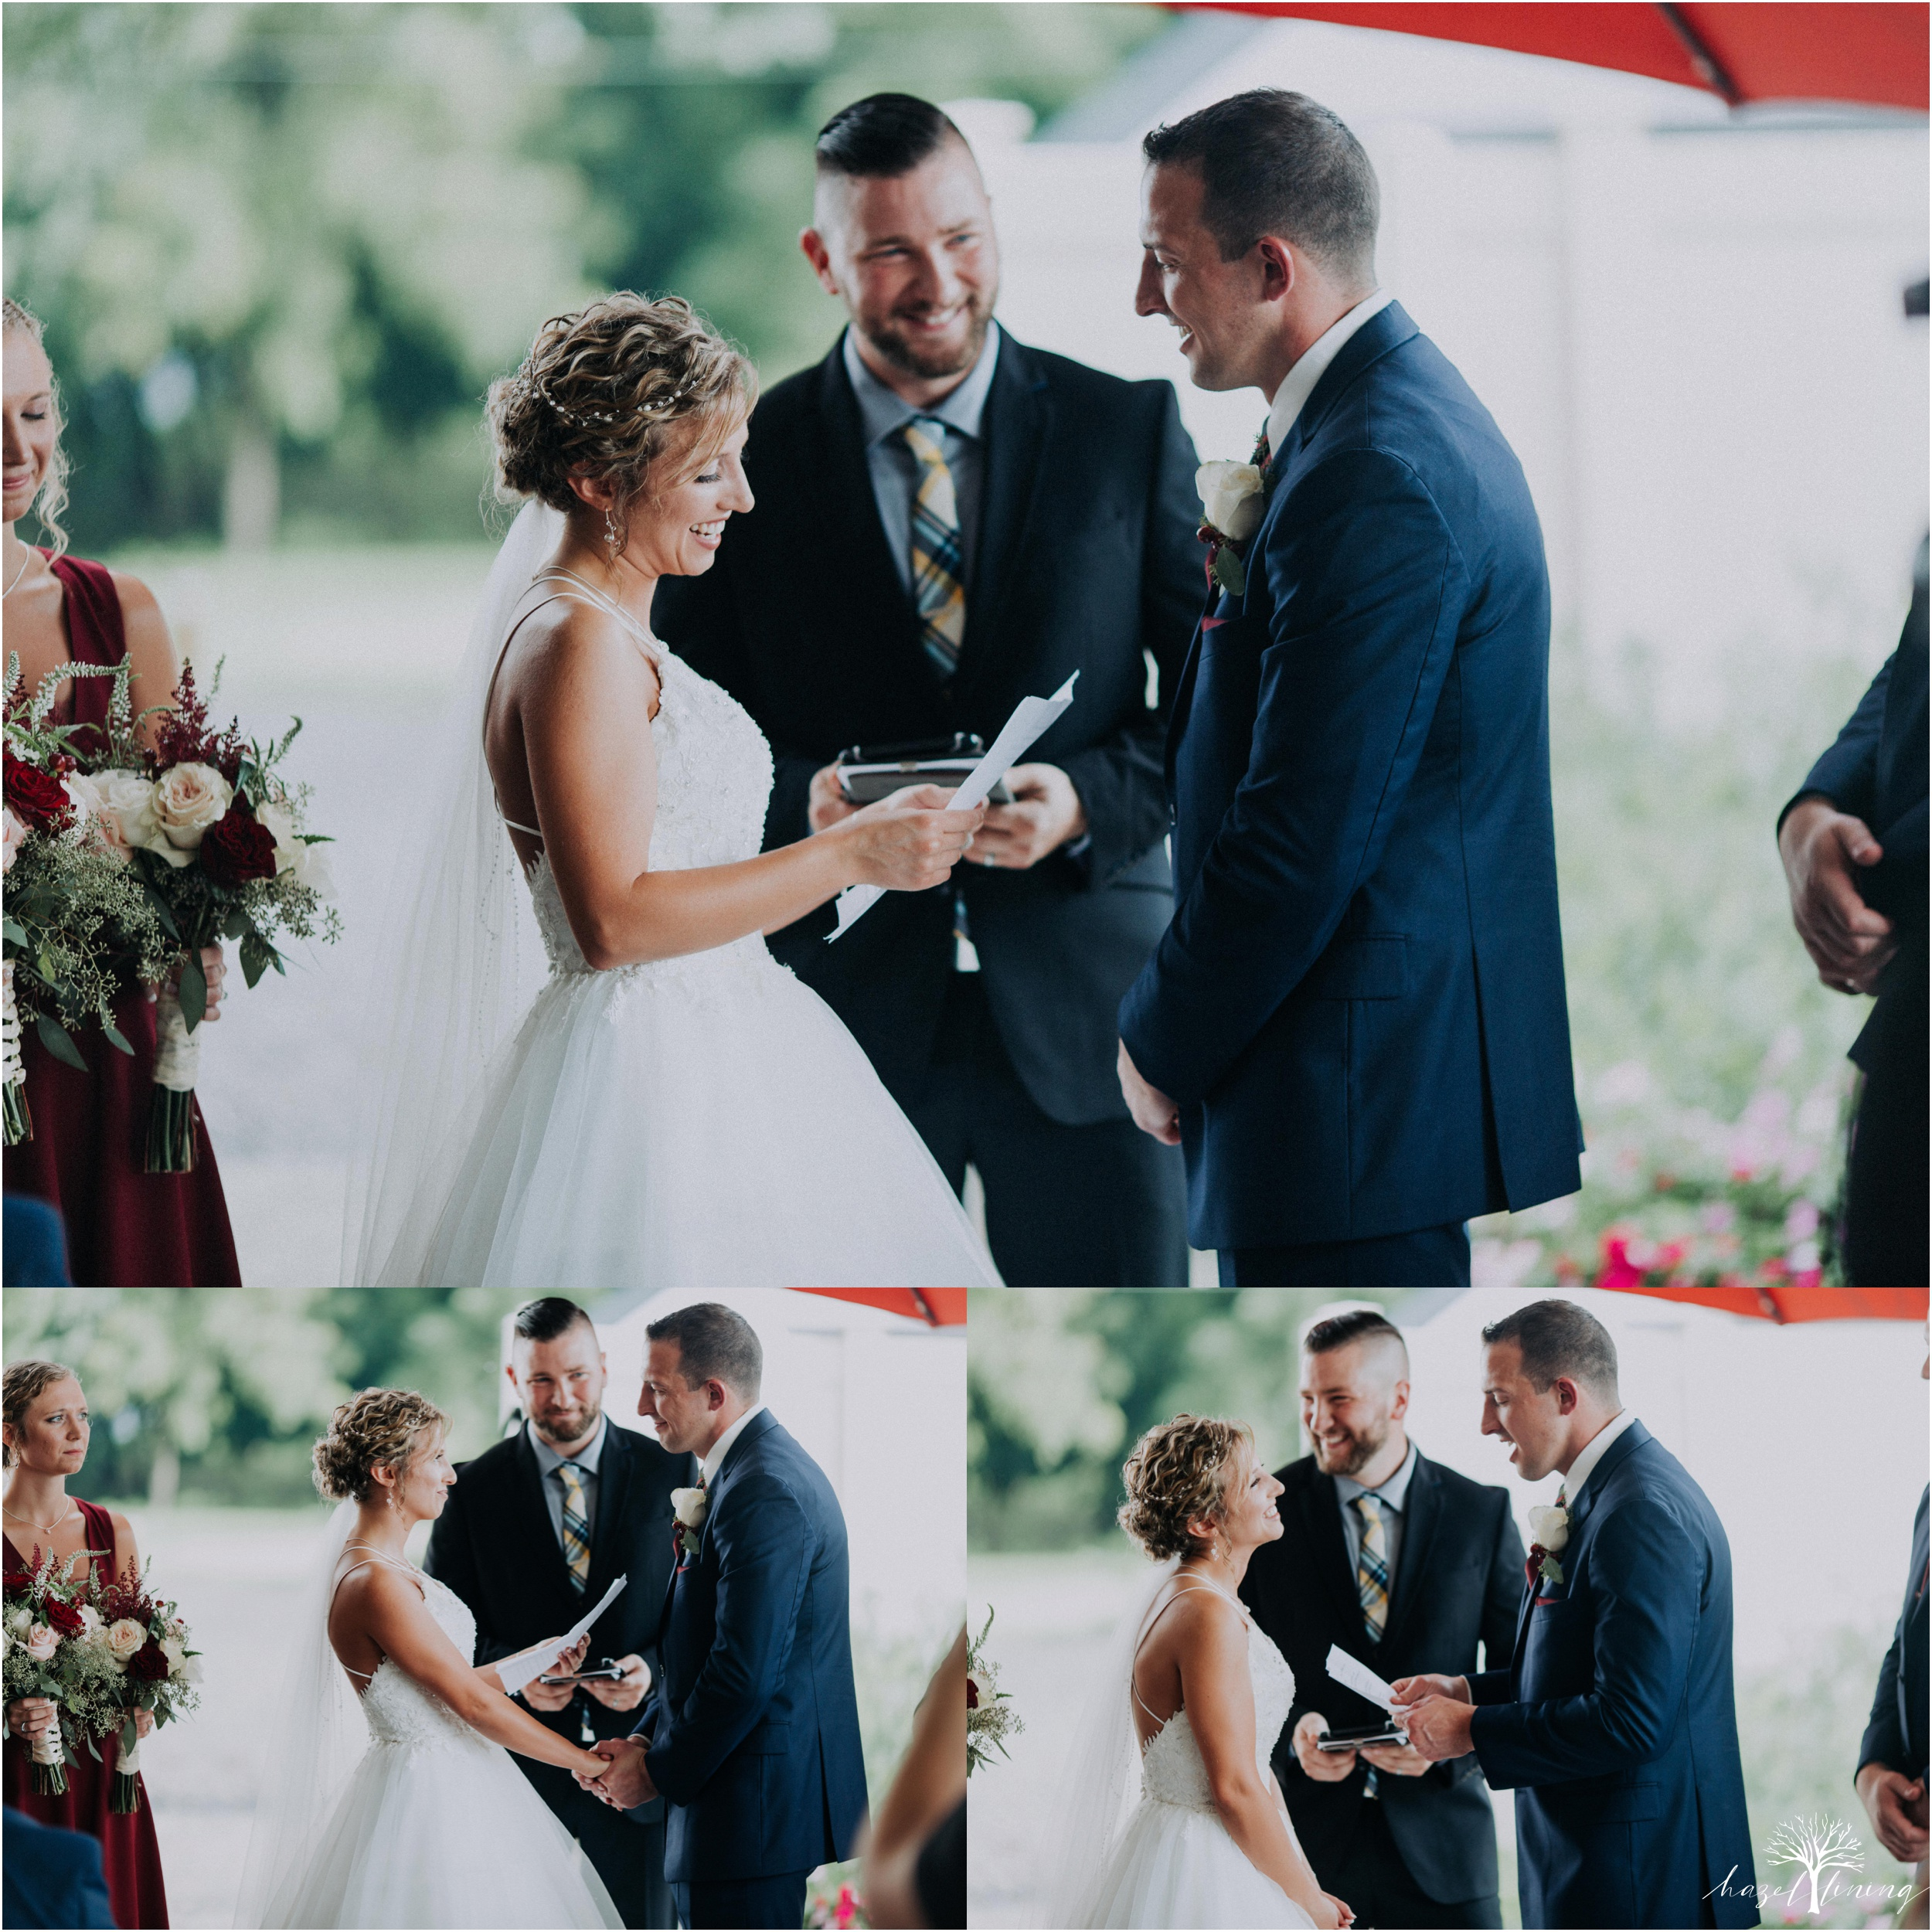 jonathan-weibel-becky-haywood-loft-at-sweetwater-cc-pennsburg-pennsylvania-rainy-day-summer-wedding-hazel-lining-travel-wedding-elopement-photography_0047.jpg